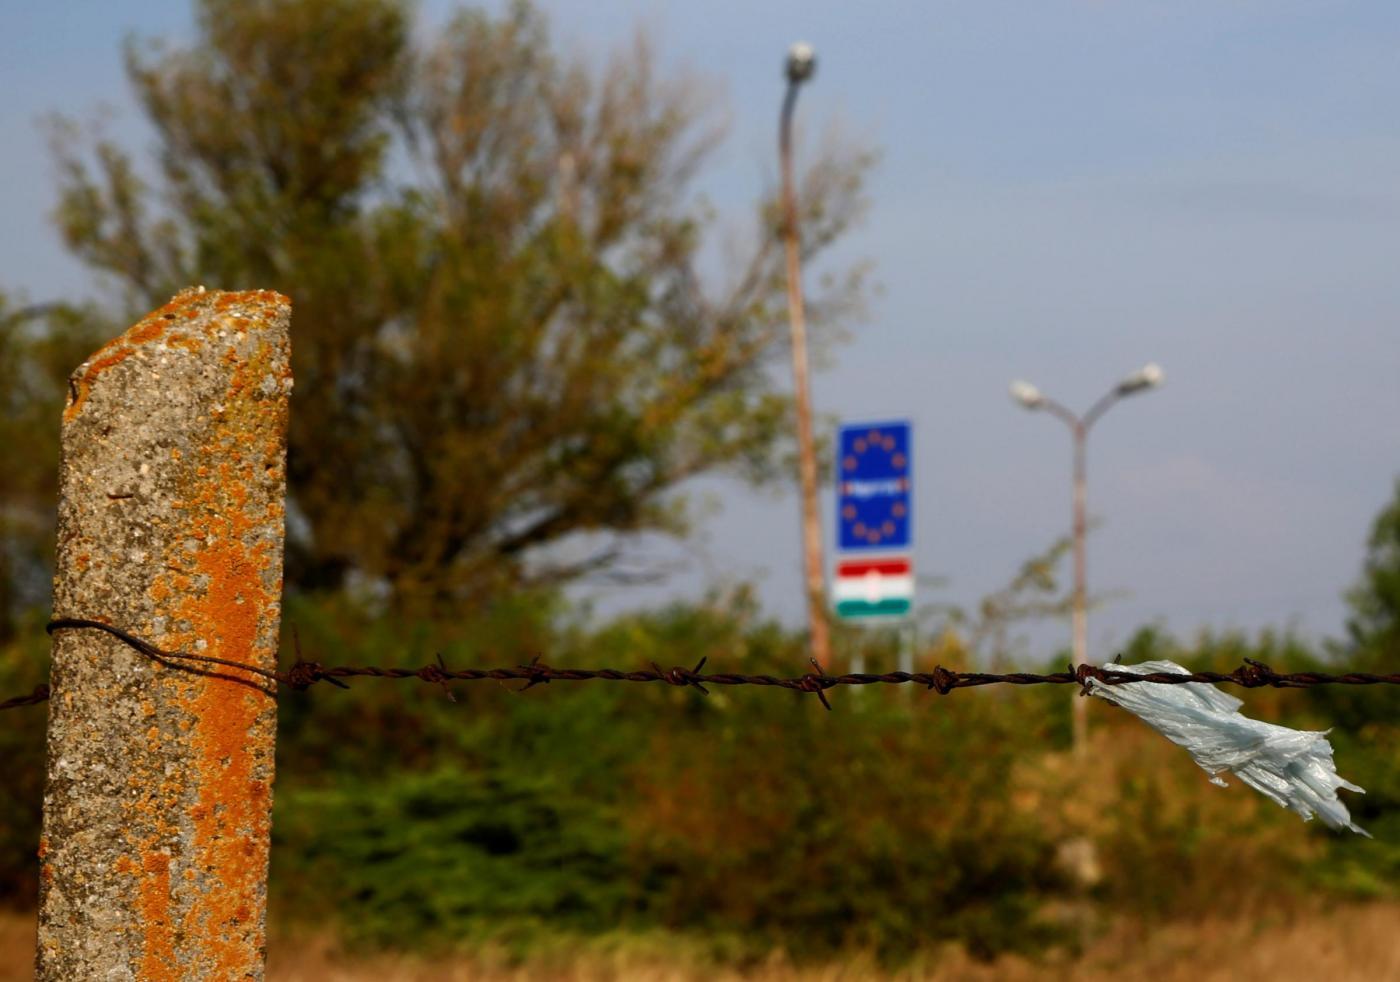 Ungheria, referendum per dire NO ai migranti: quorum non raggiunto